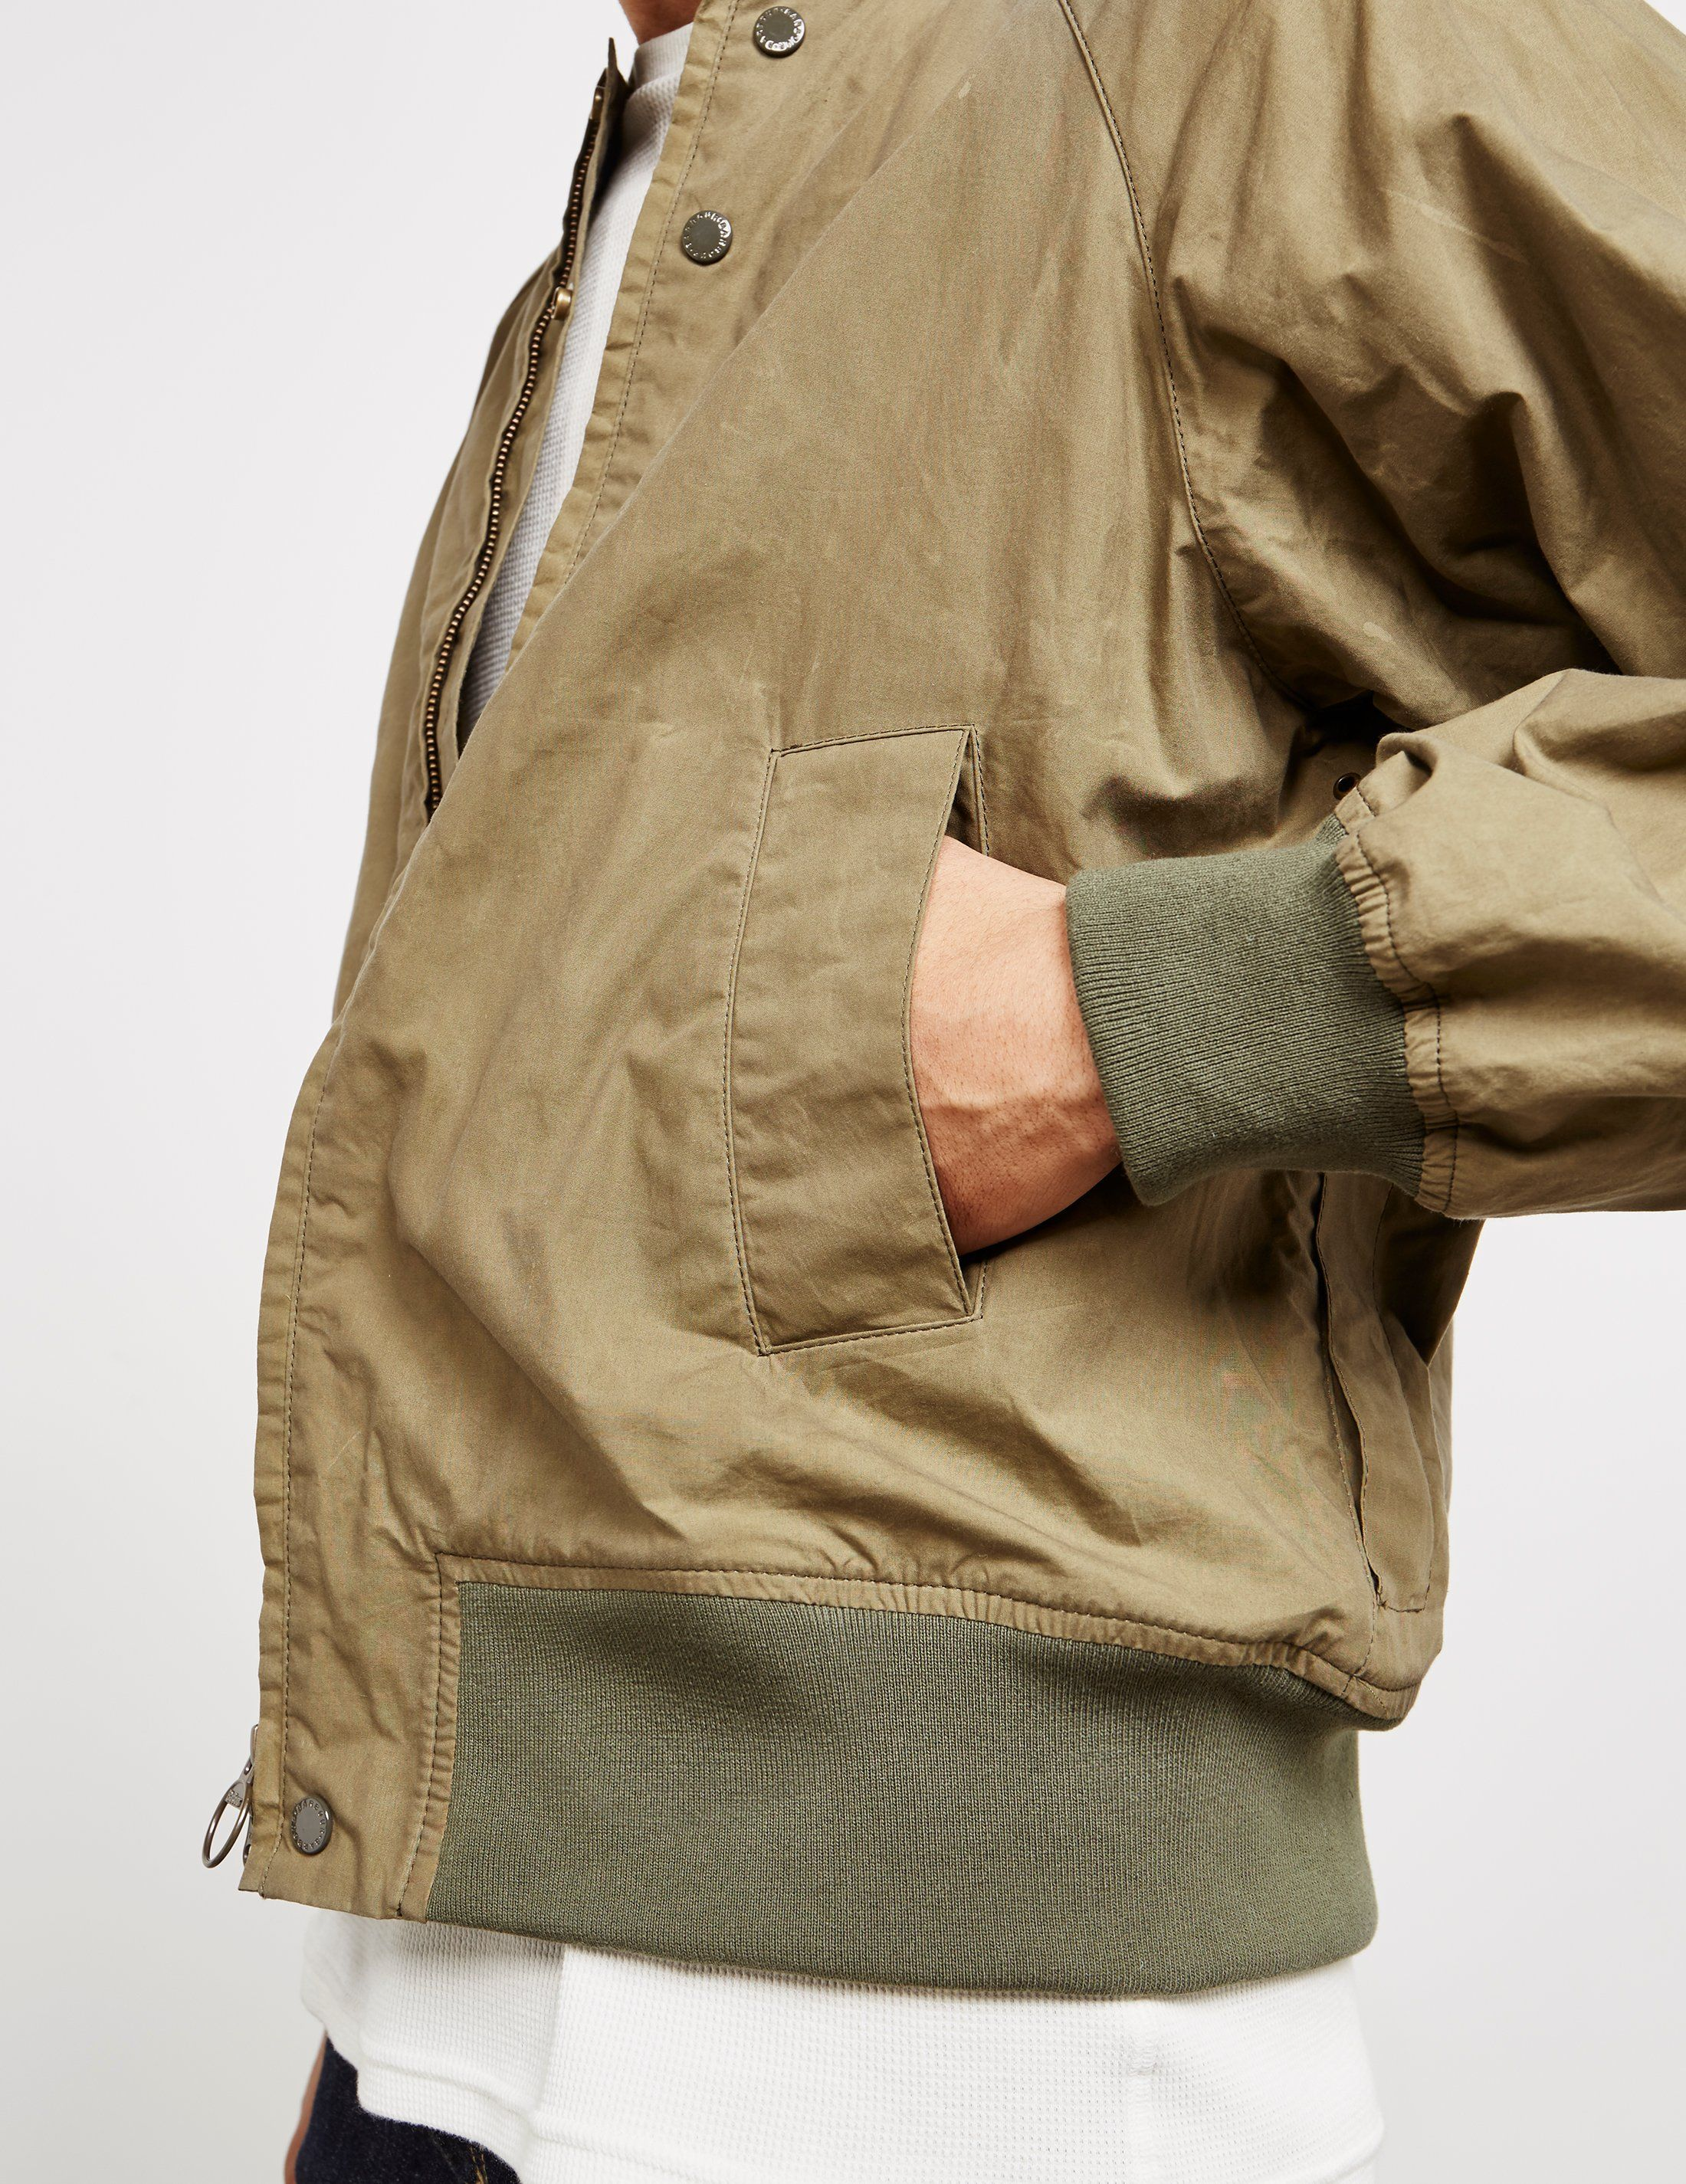 Barbour x Engineered Garments Irving Bomber Jacket